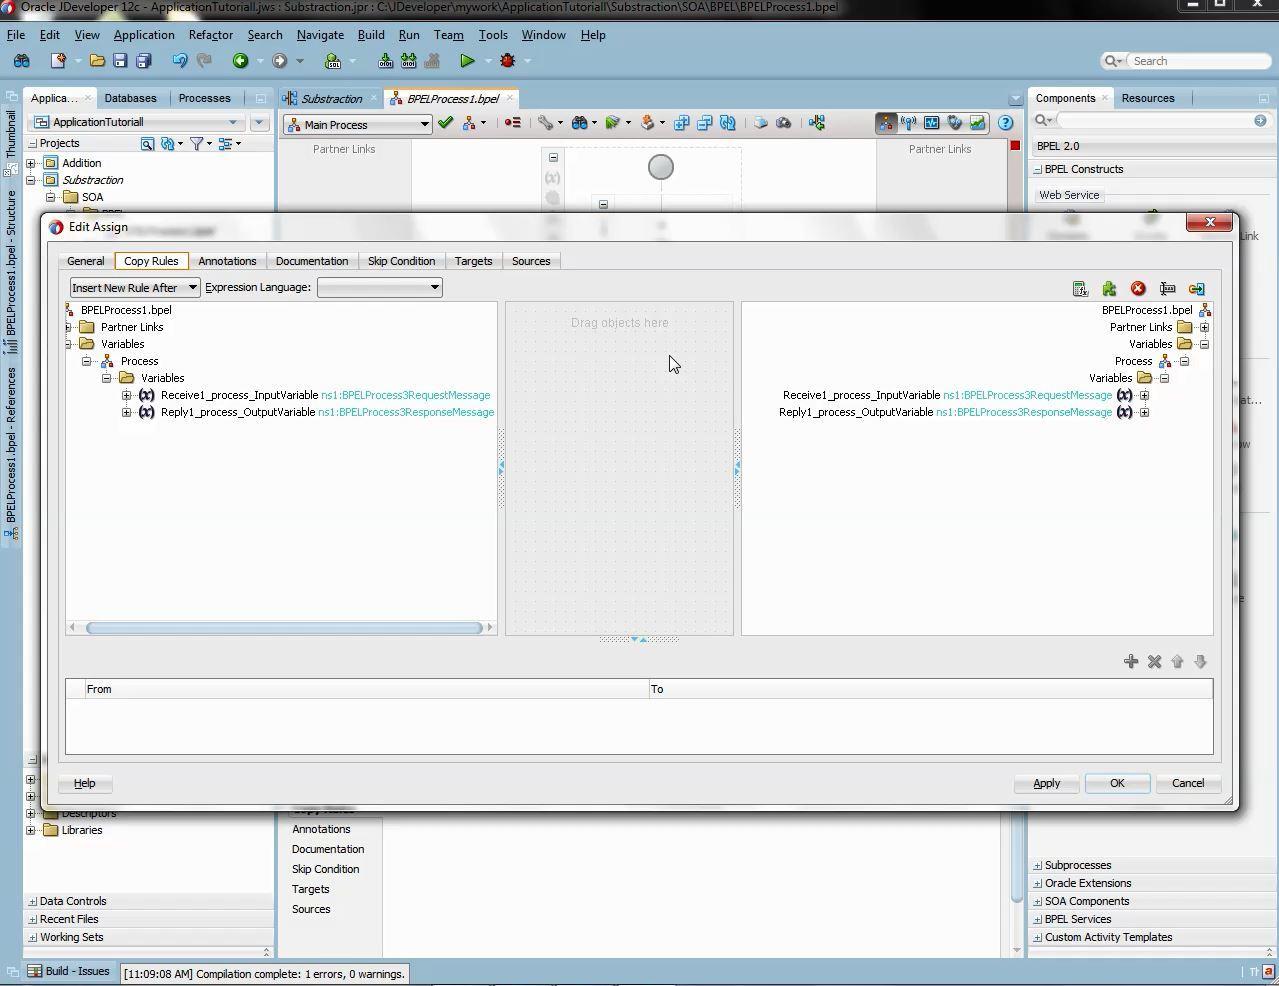 D:\Data For Transfer\Screenshots\Substract No Service\26.JPG